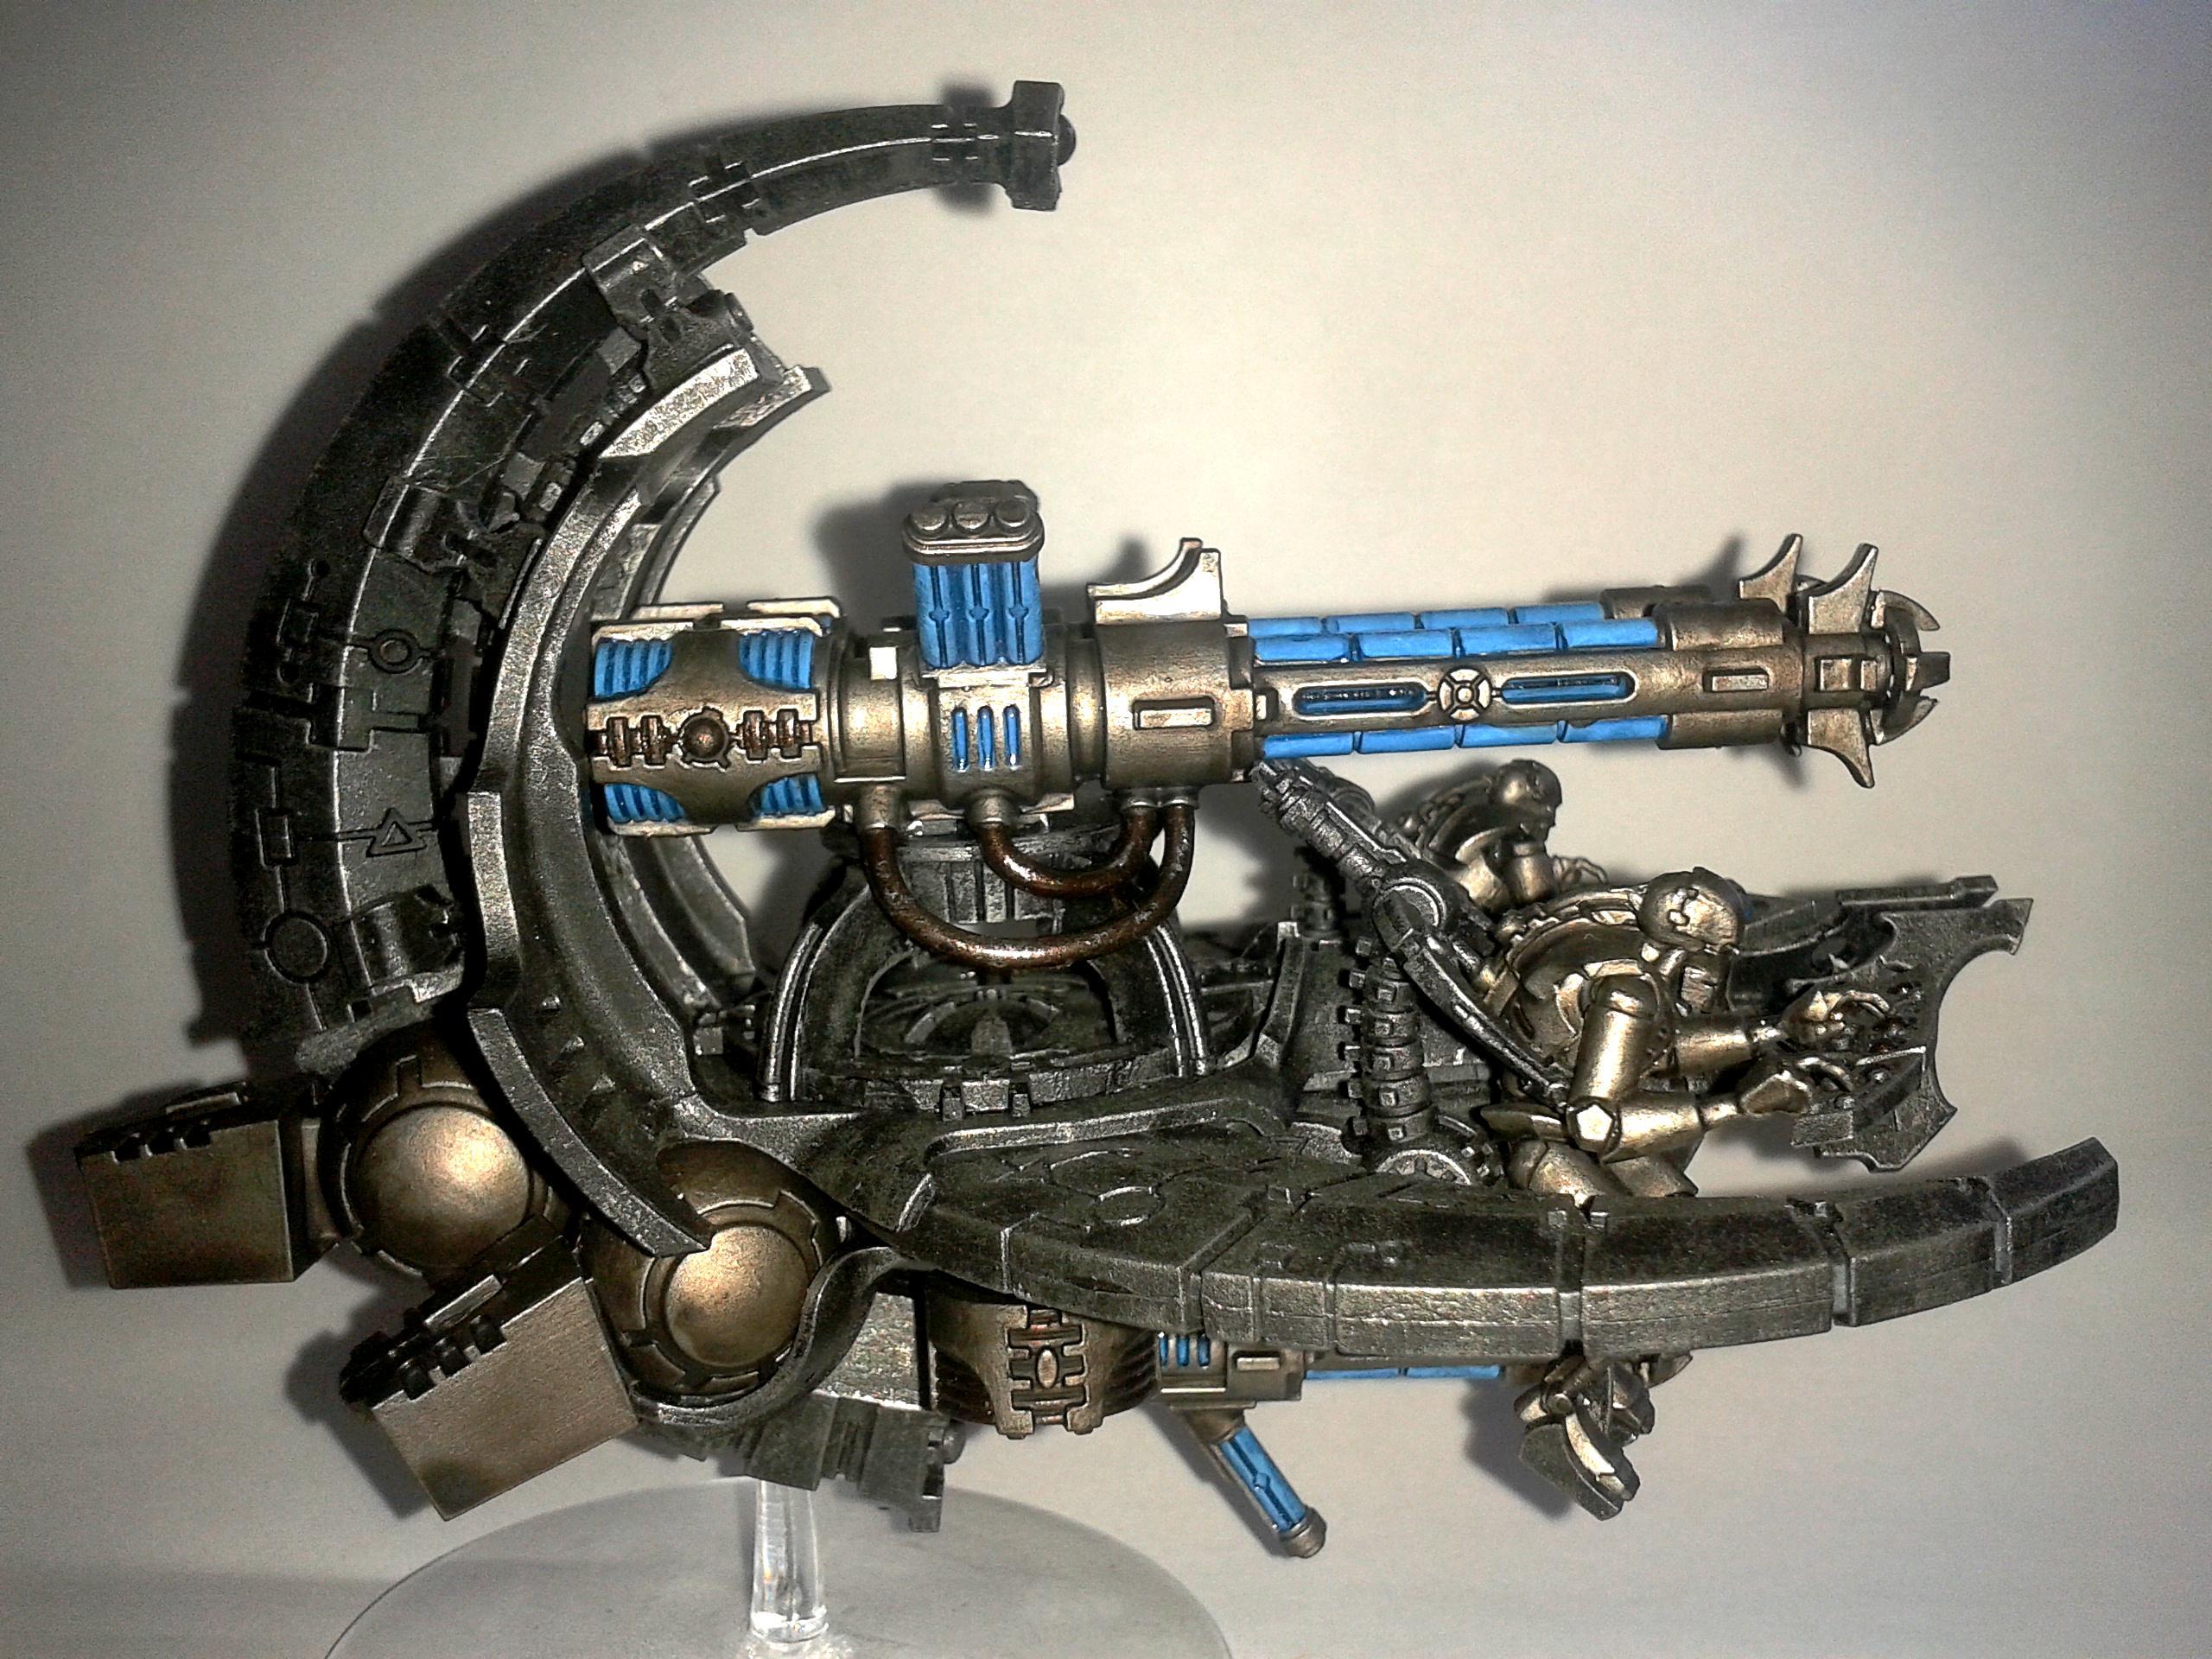 Annihilation, Barge, Boltgun, Gauss, Magnet, Metal, Necrons, Rough, Tesla